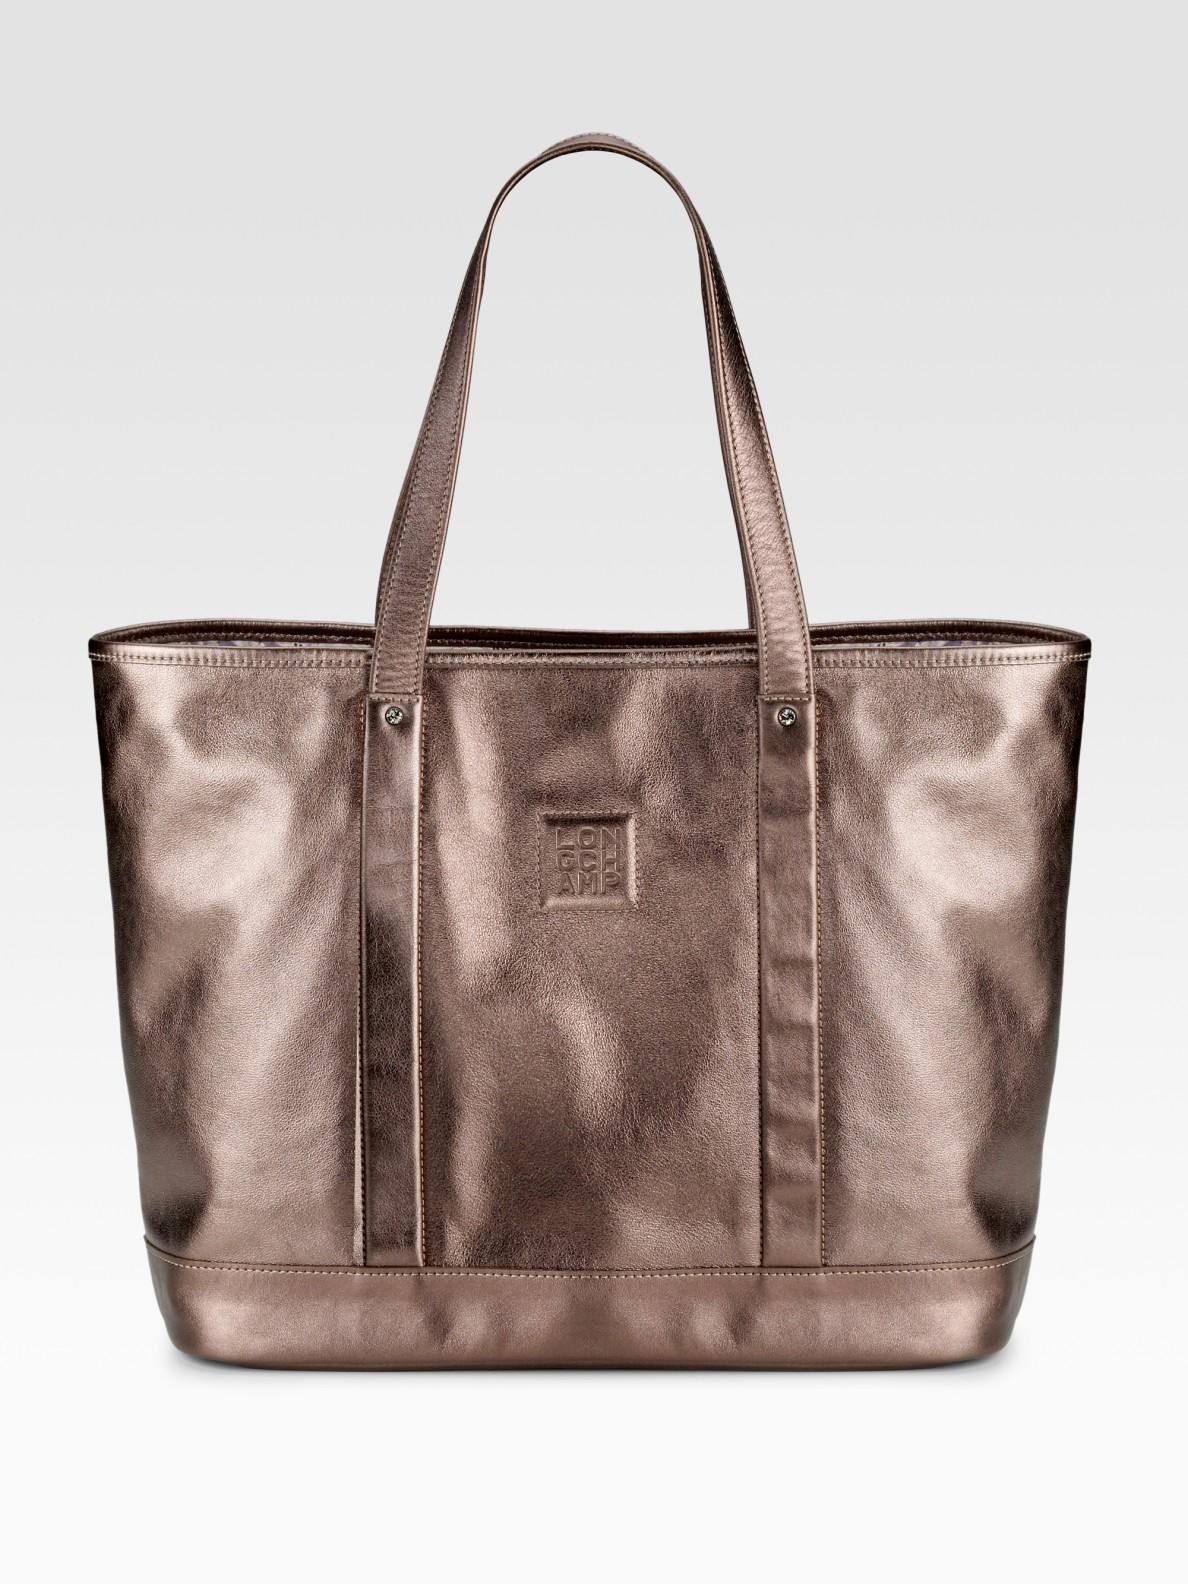 Longchamp Inspired Tote April 2017